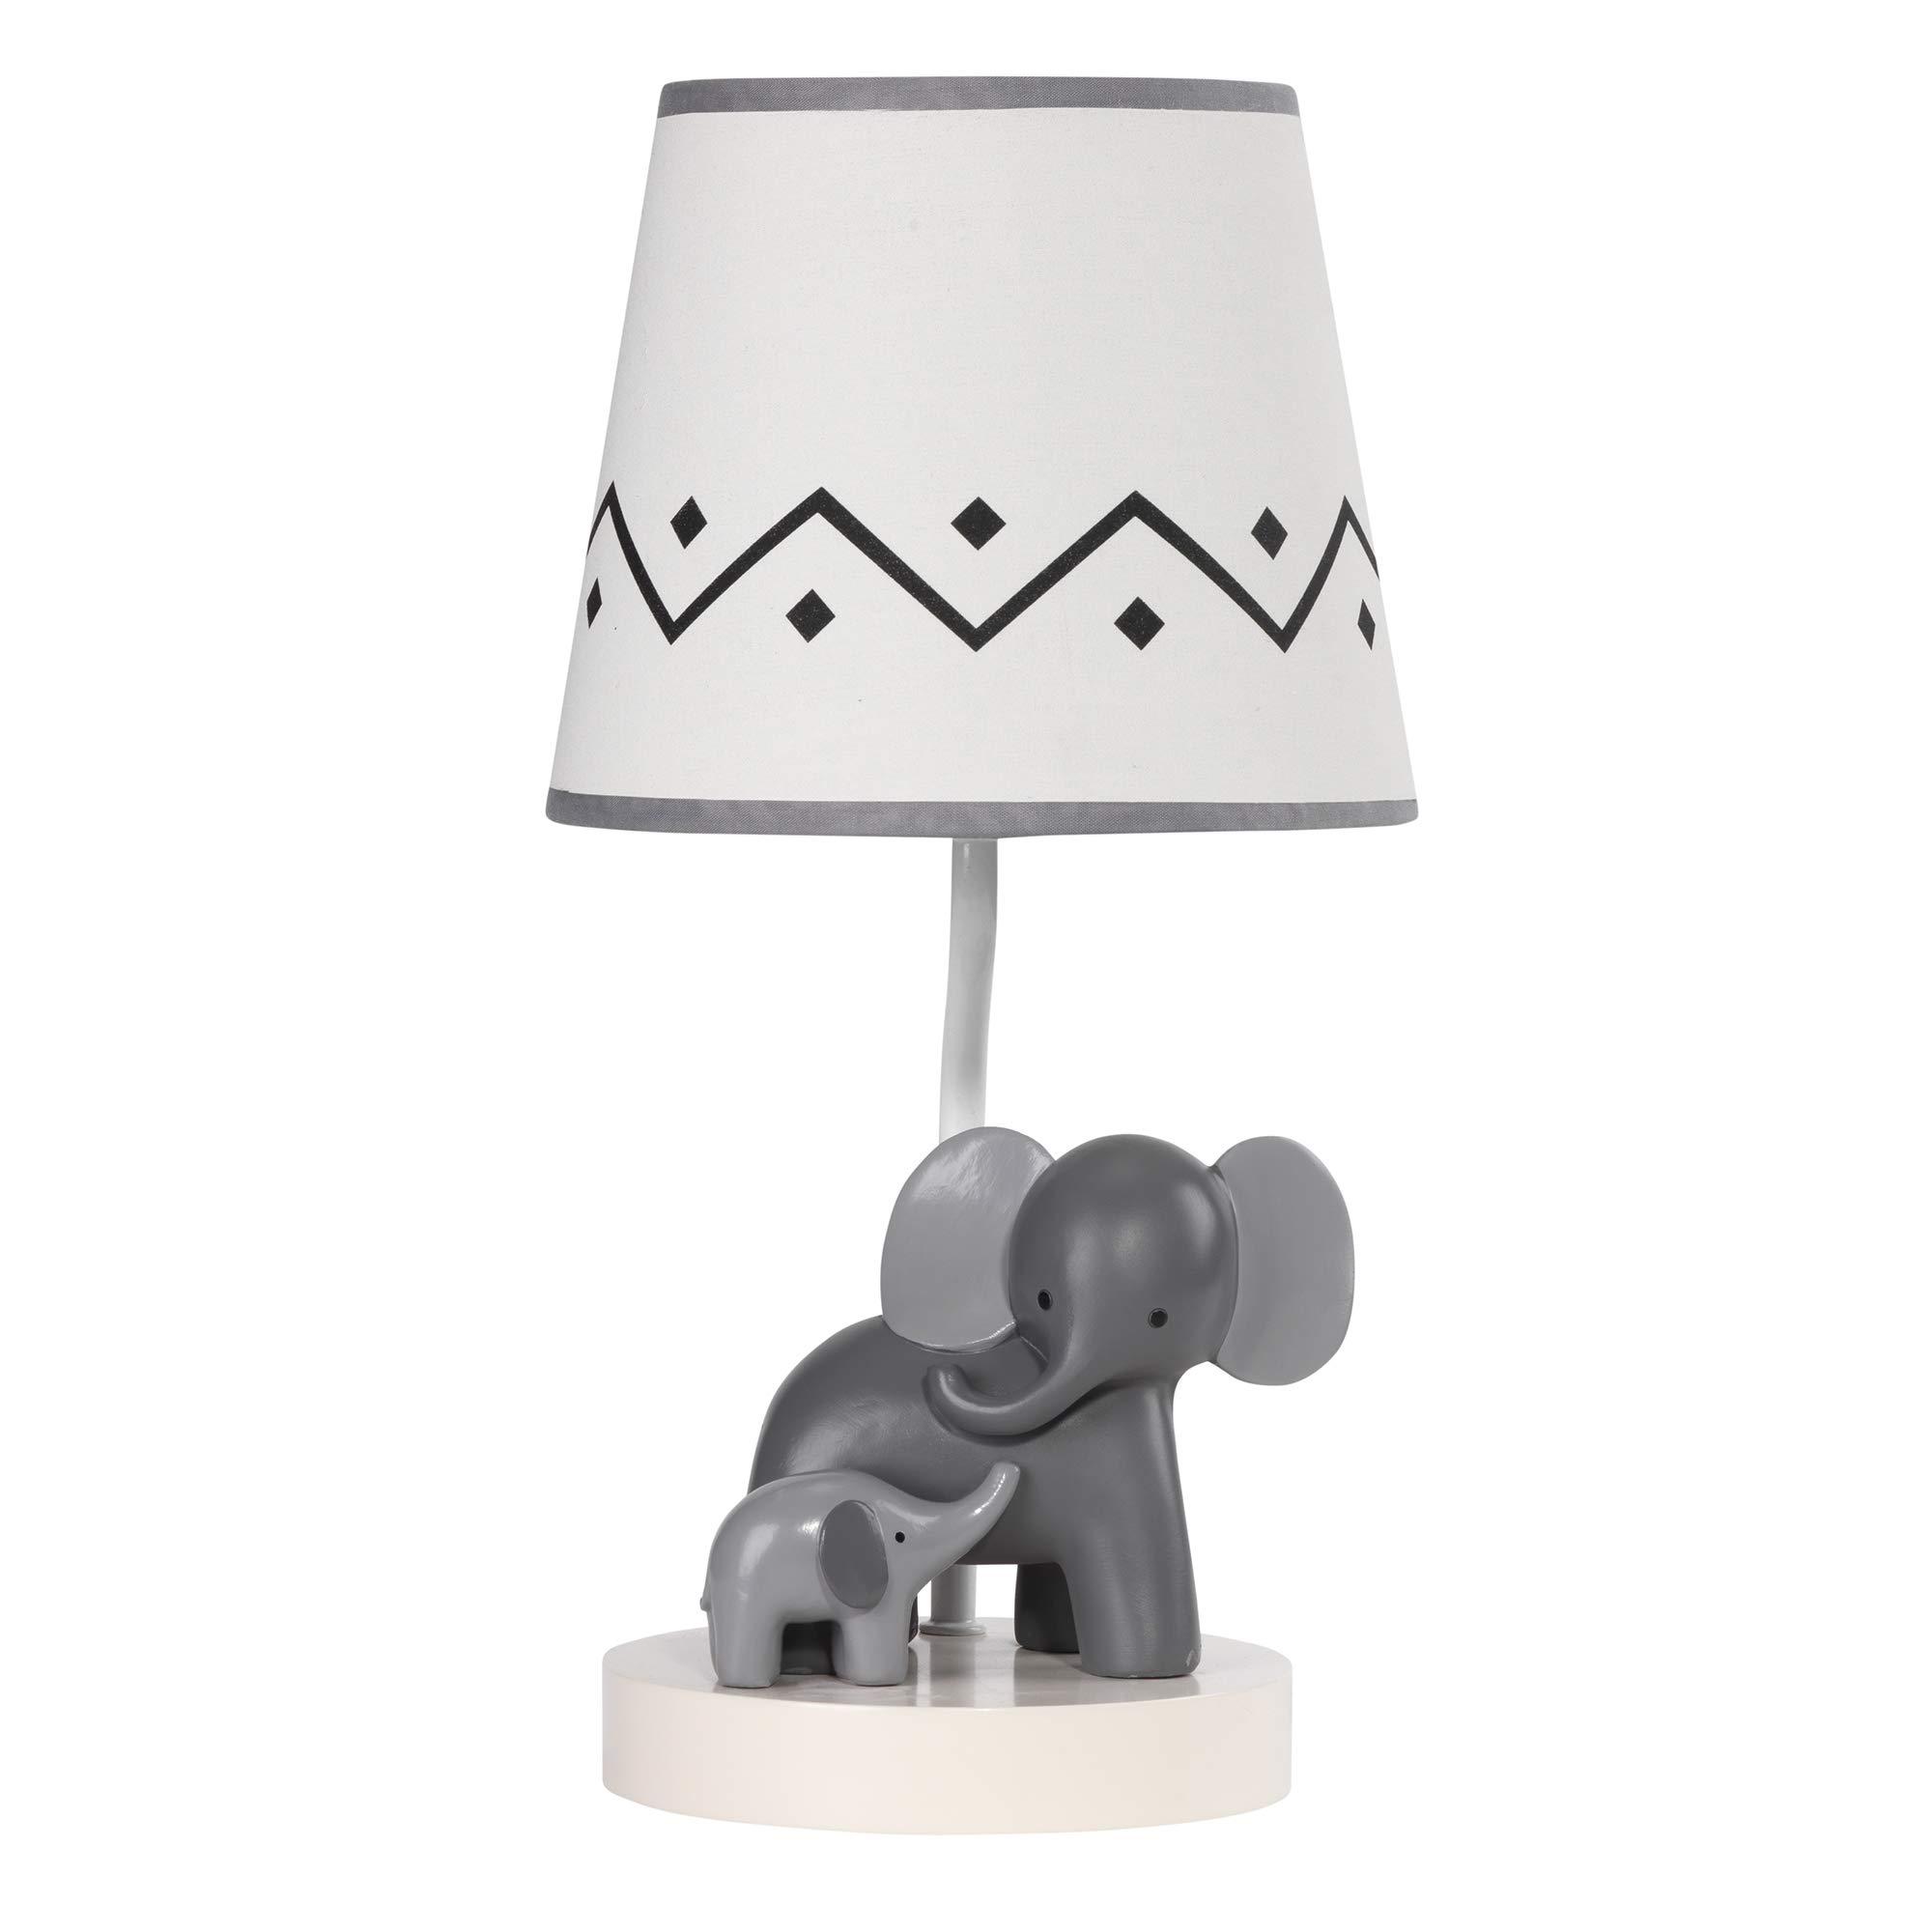 Lambs & Ivy Me & Mama White/Gray Elephant Nursery Lamp with Shade & Bulb by Lambs & Ivy